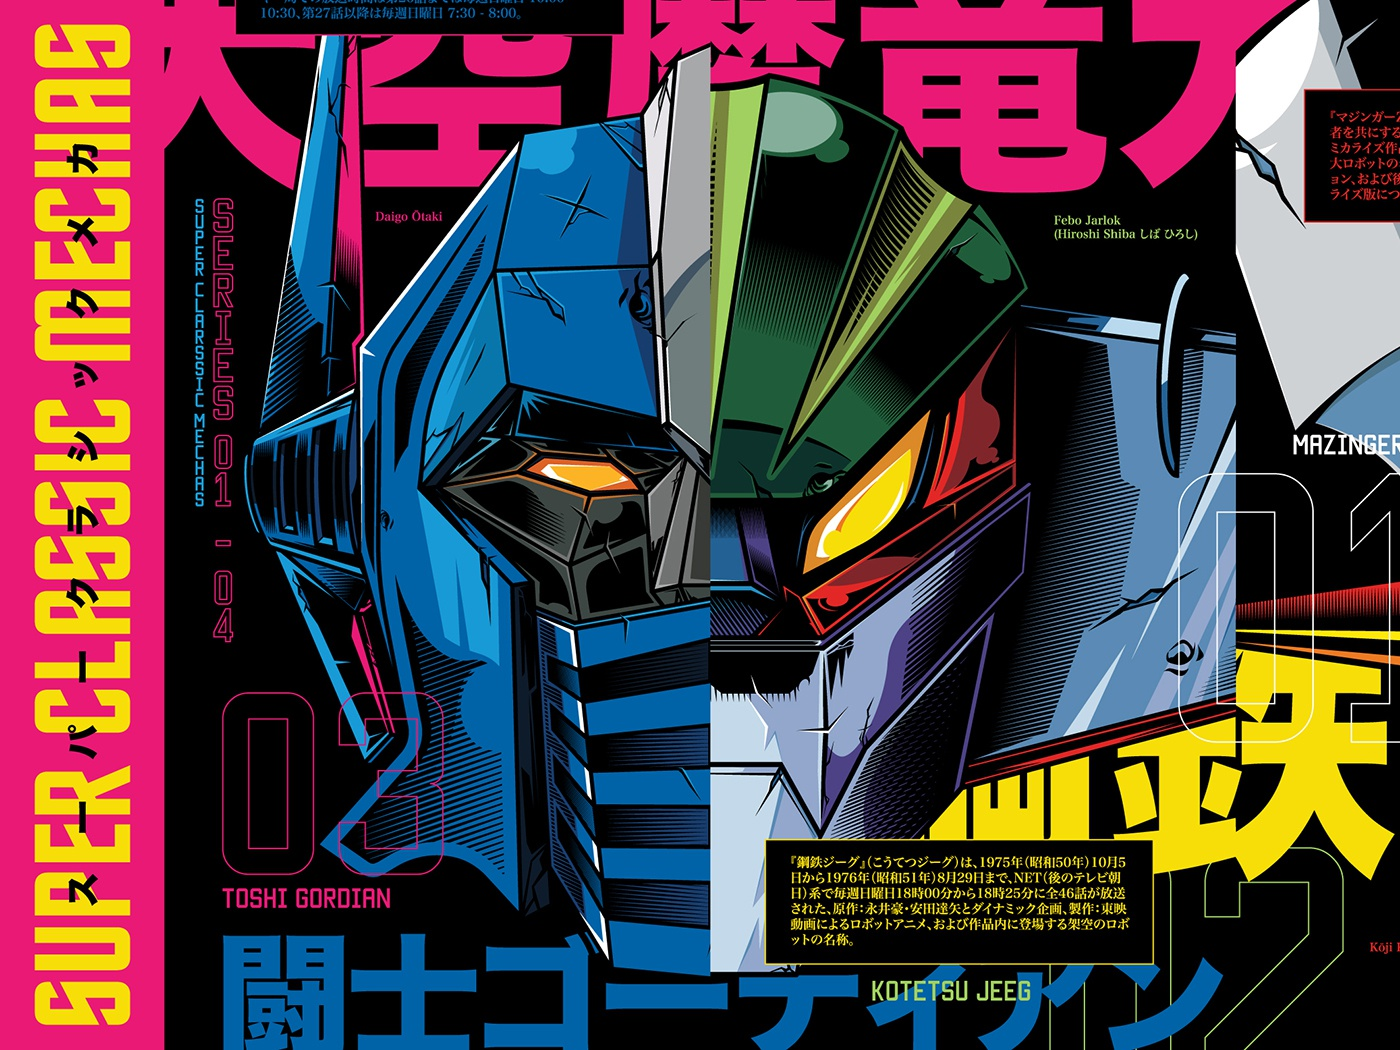 Super Classic Mechas Book pages gaiking gordian voltron mazinger steel jeeg retro show retro vectors anime digital art character design graphic design illustration vector